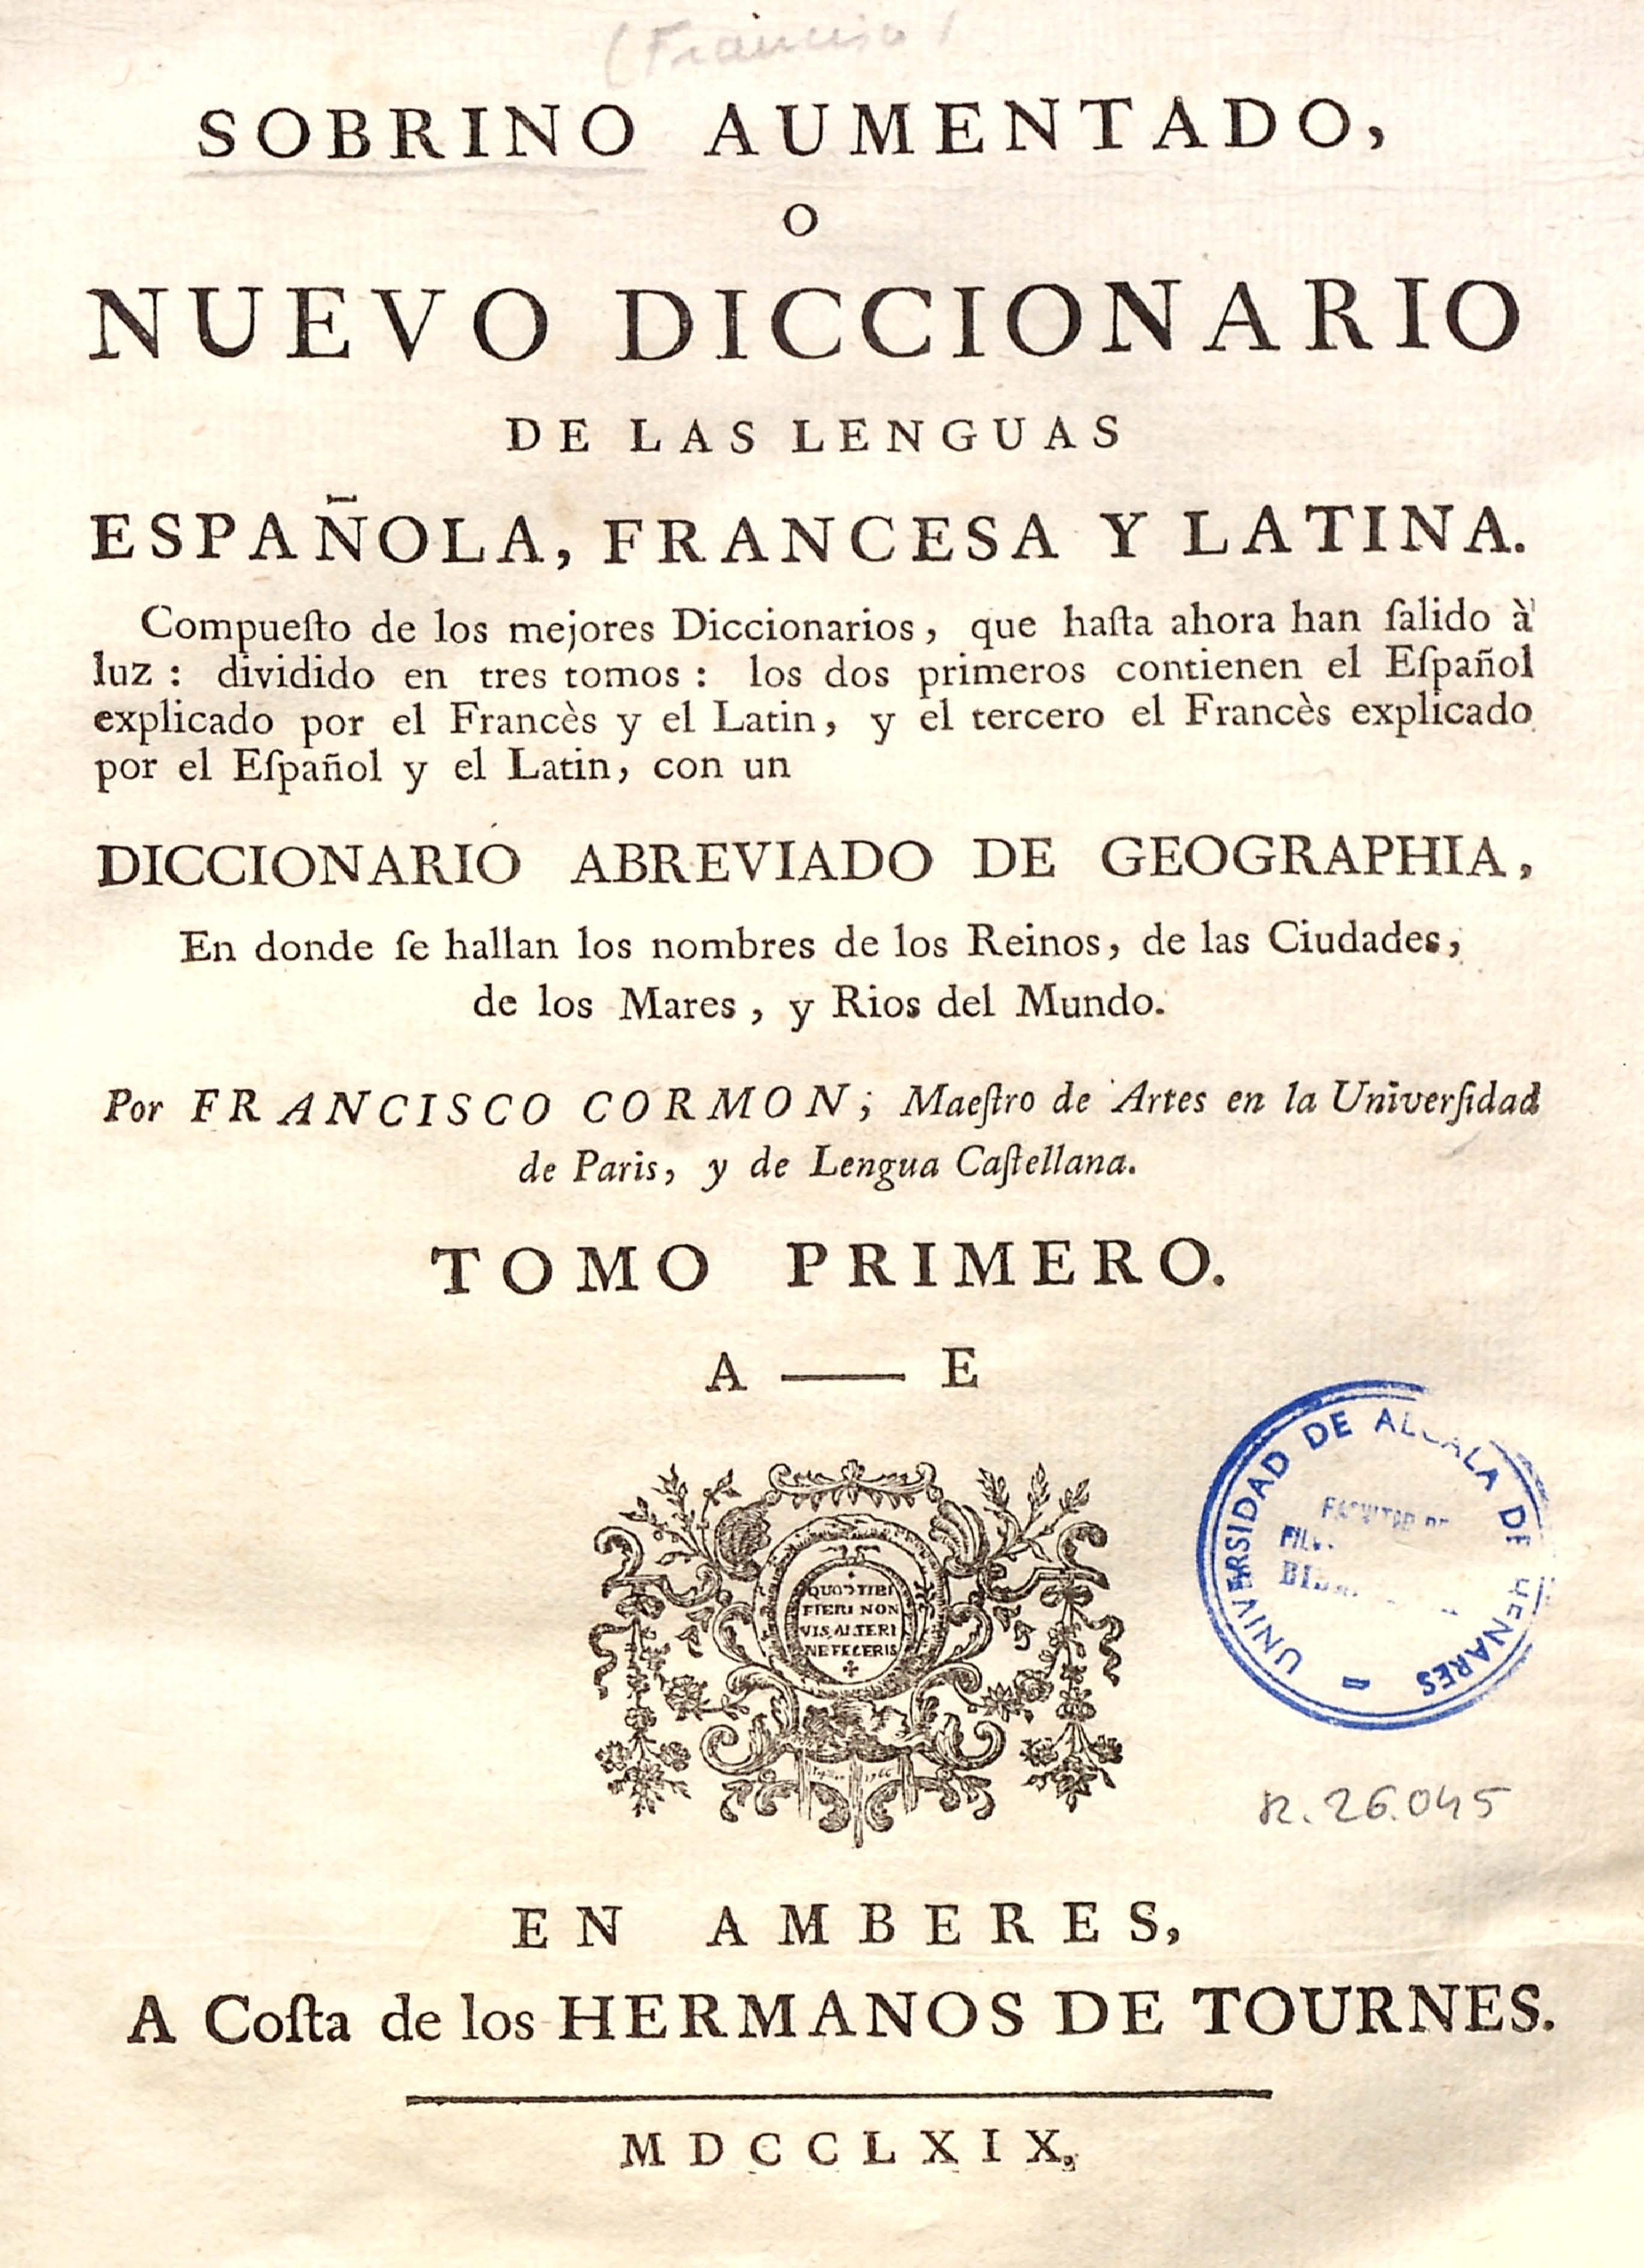 Sobrino aumentado o Nuevo diccionario..., 1769